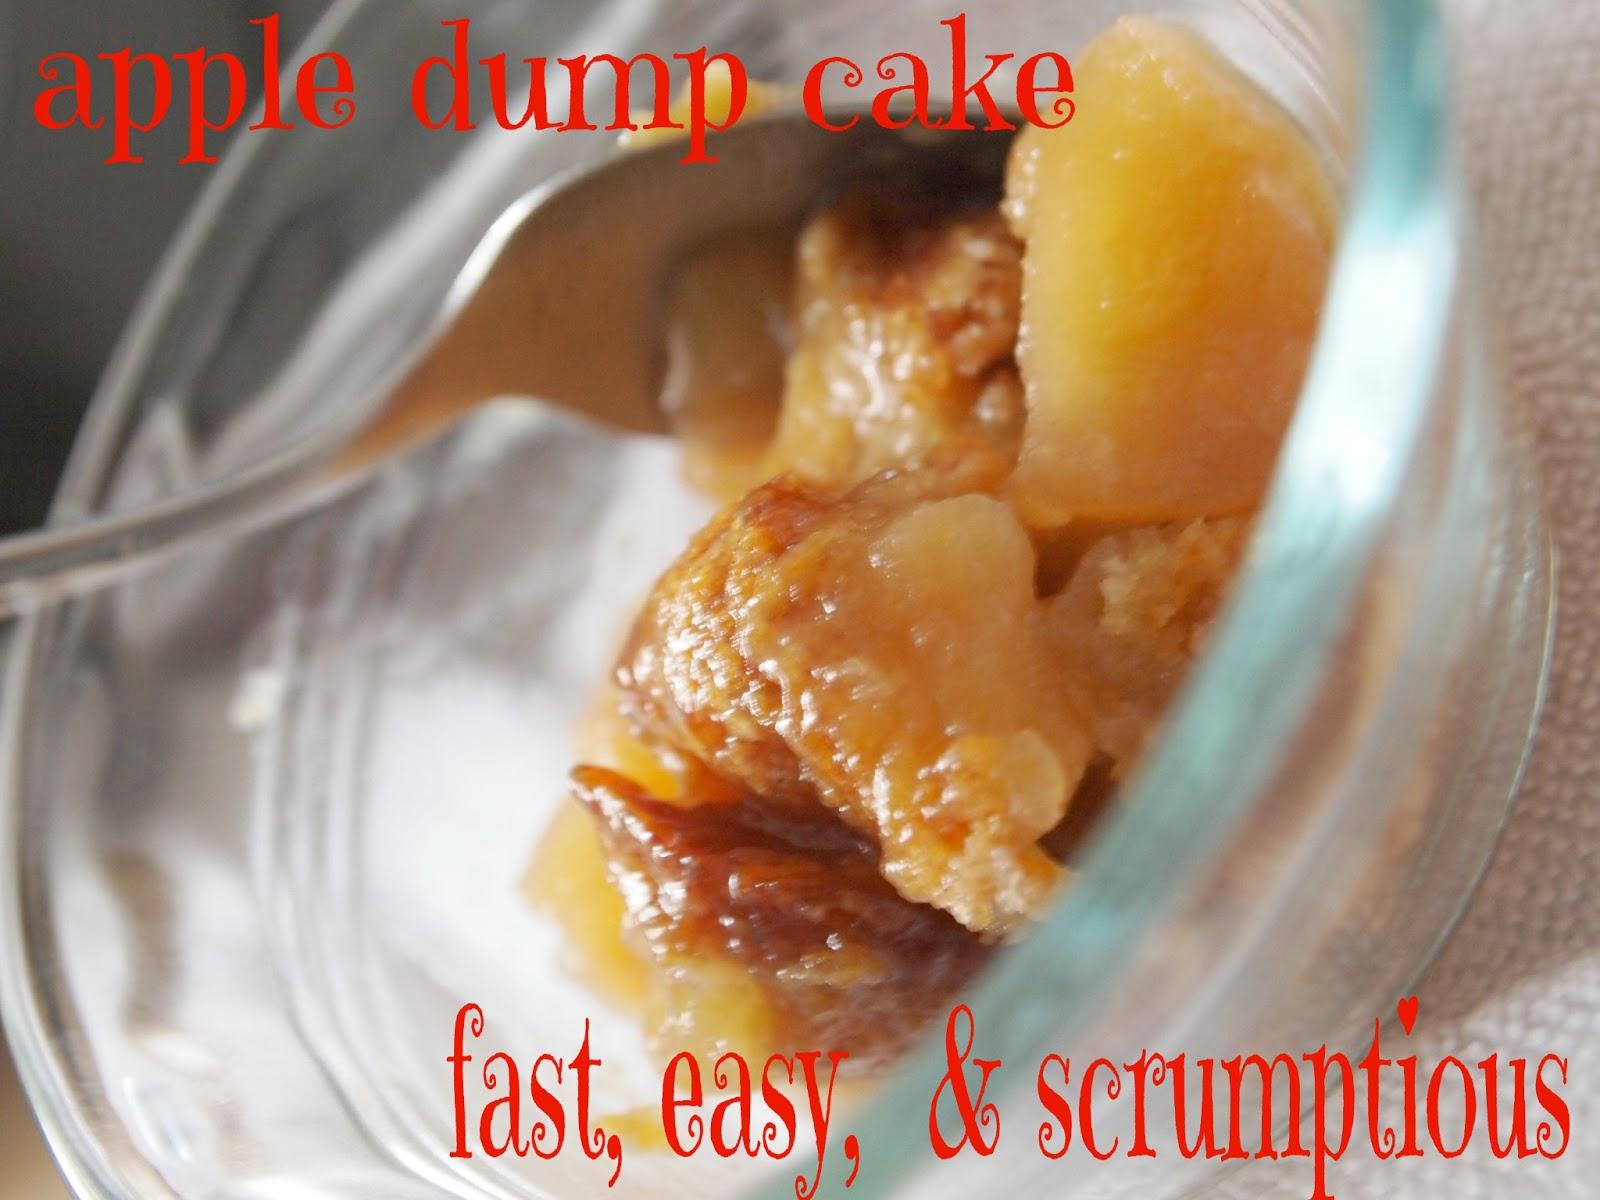 Apple Dump Cake